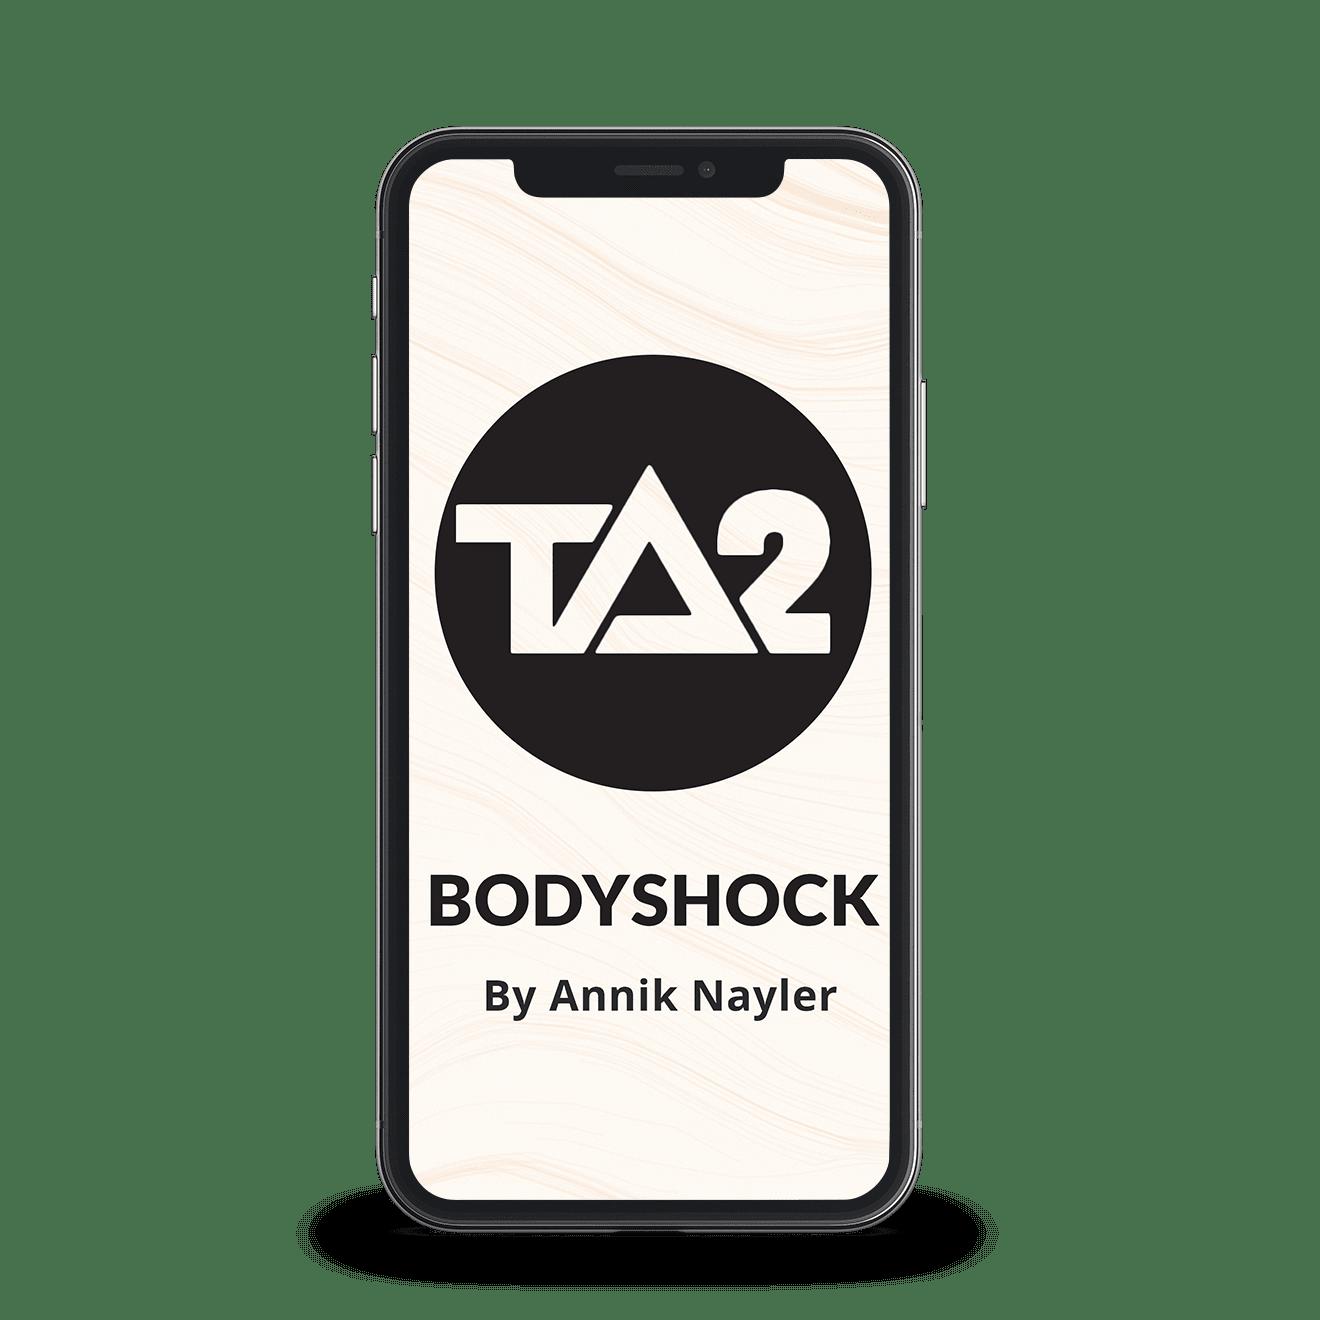 TA2 Bodyshock